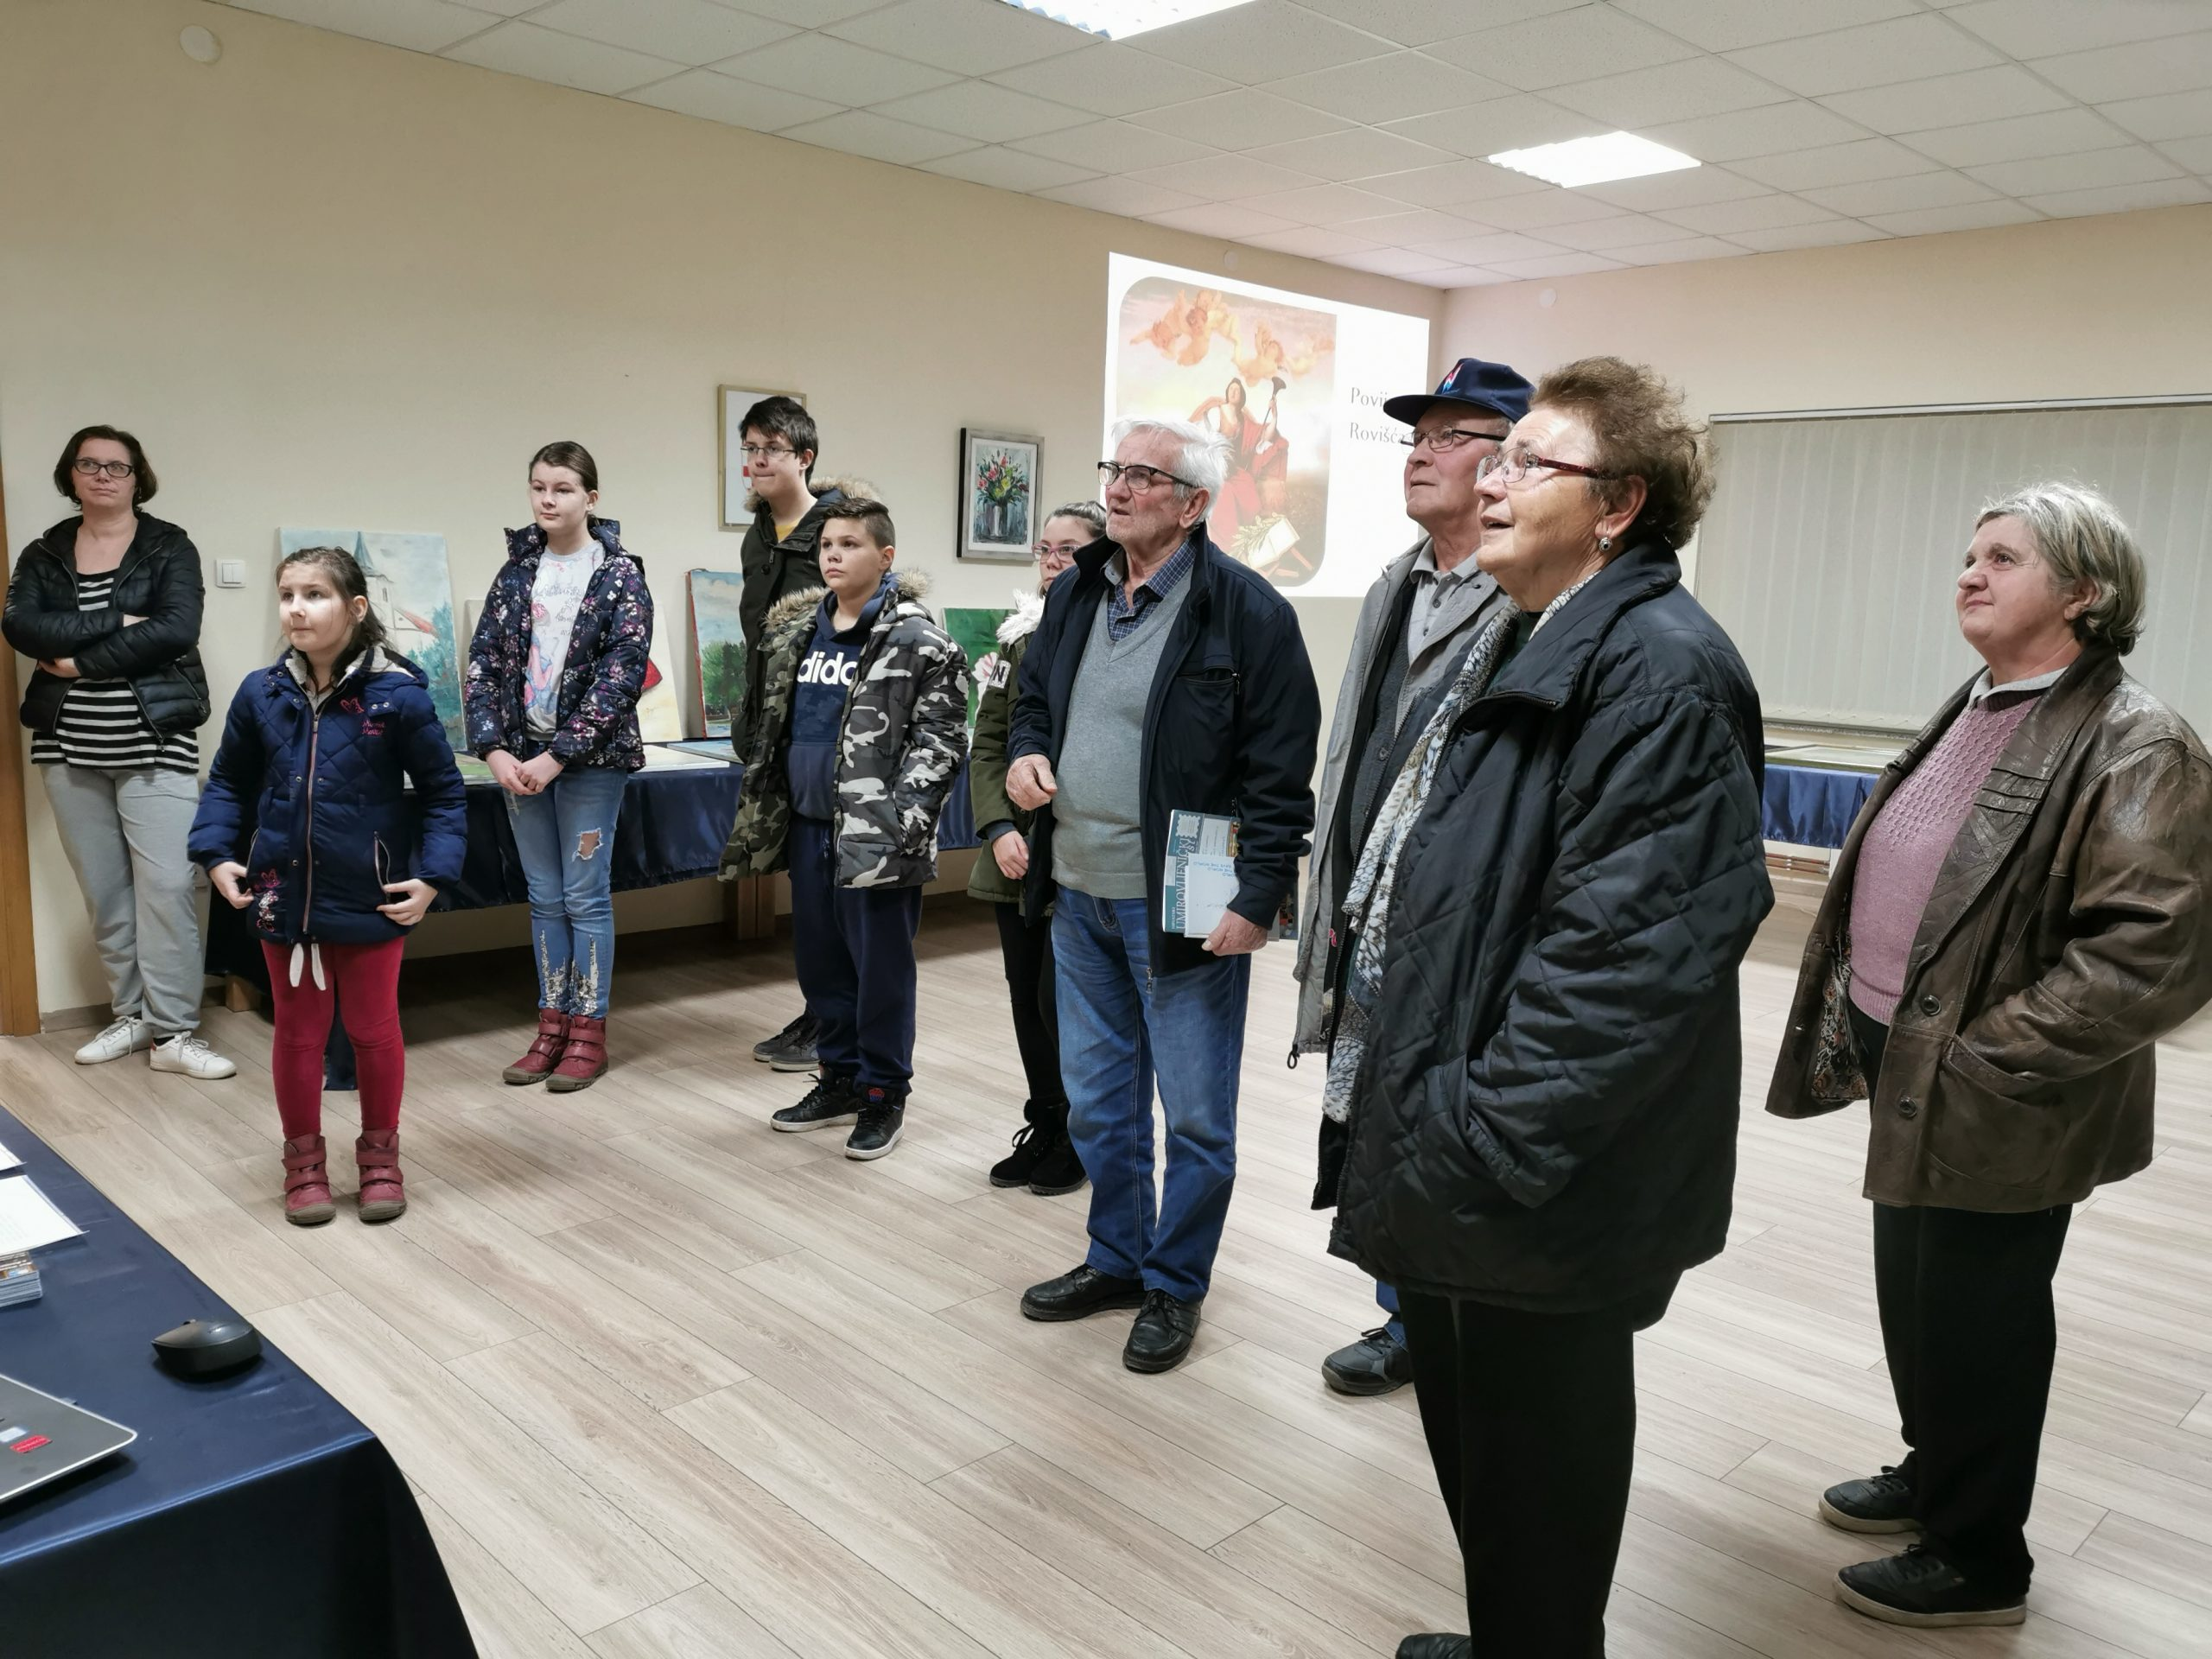 BOGAT PROGRAM Uspješna prva Noć muzeja u Rovišću